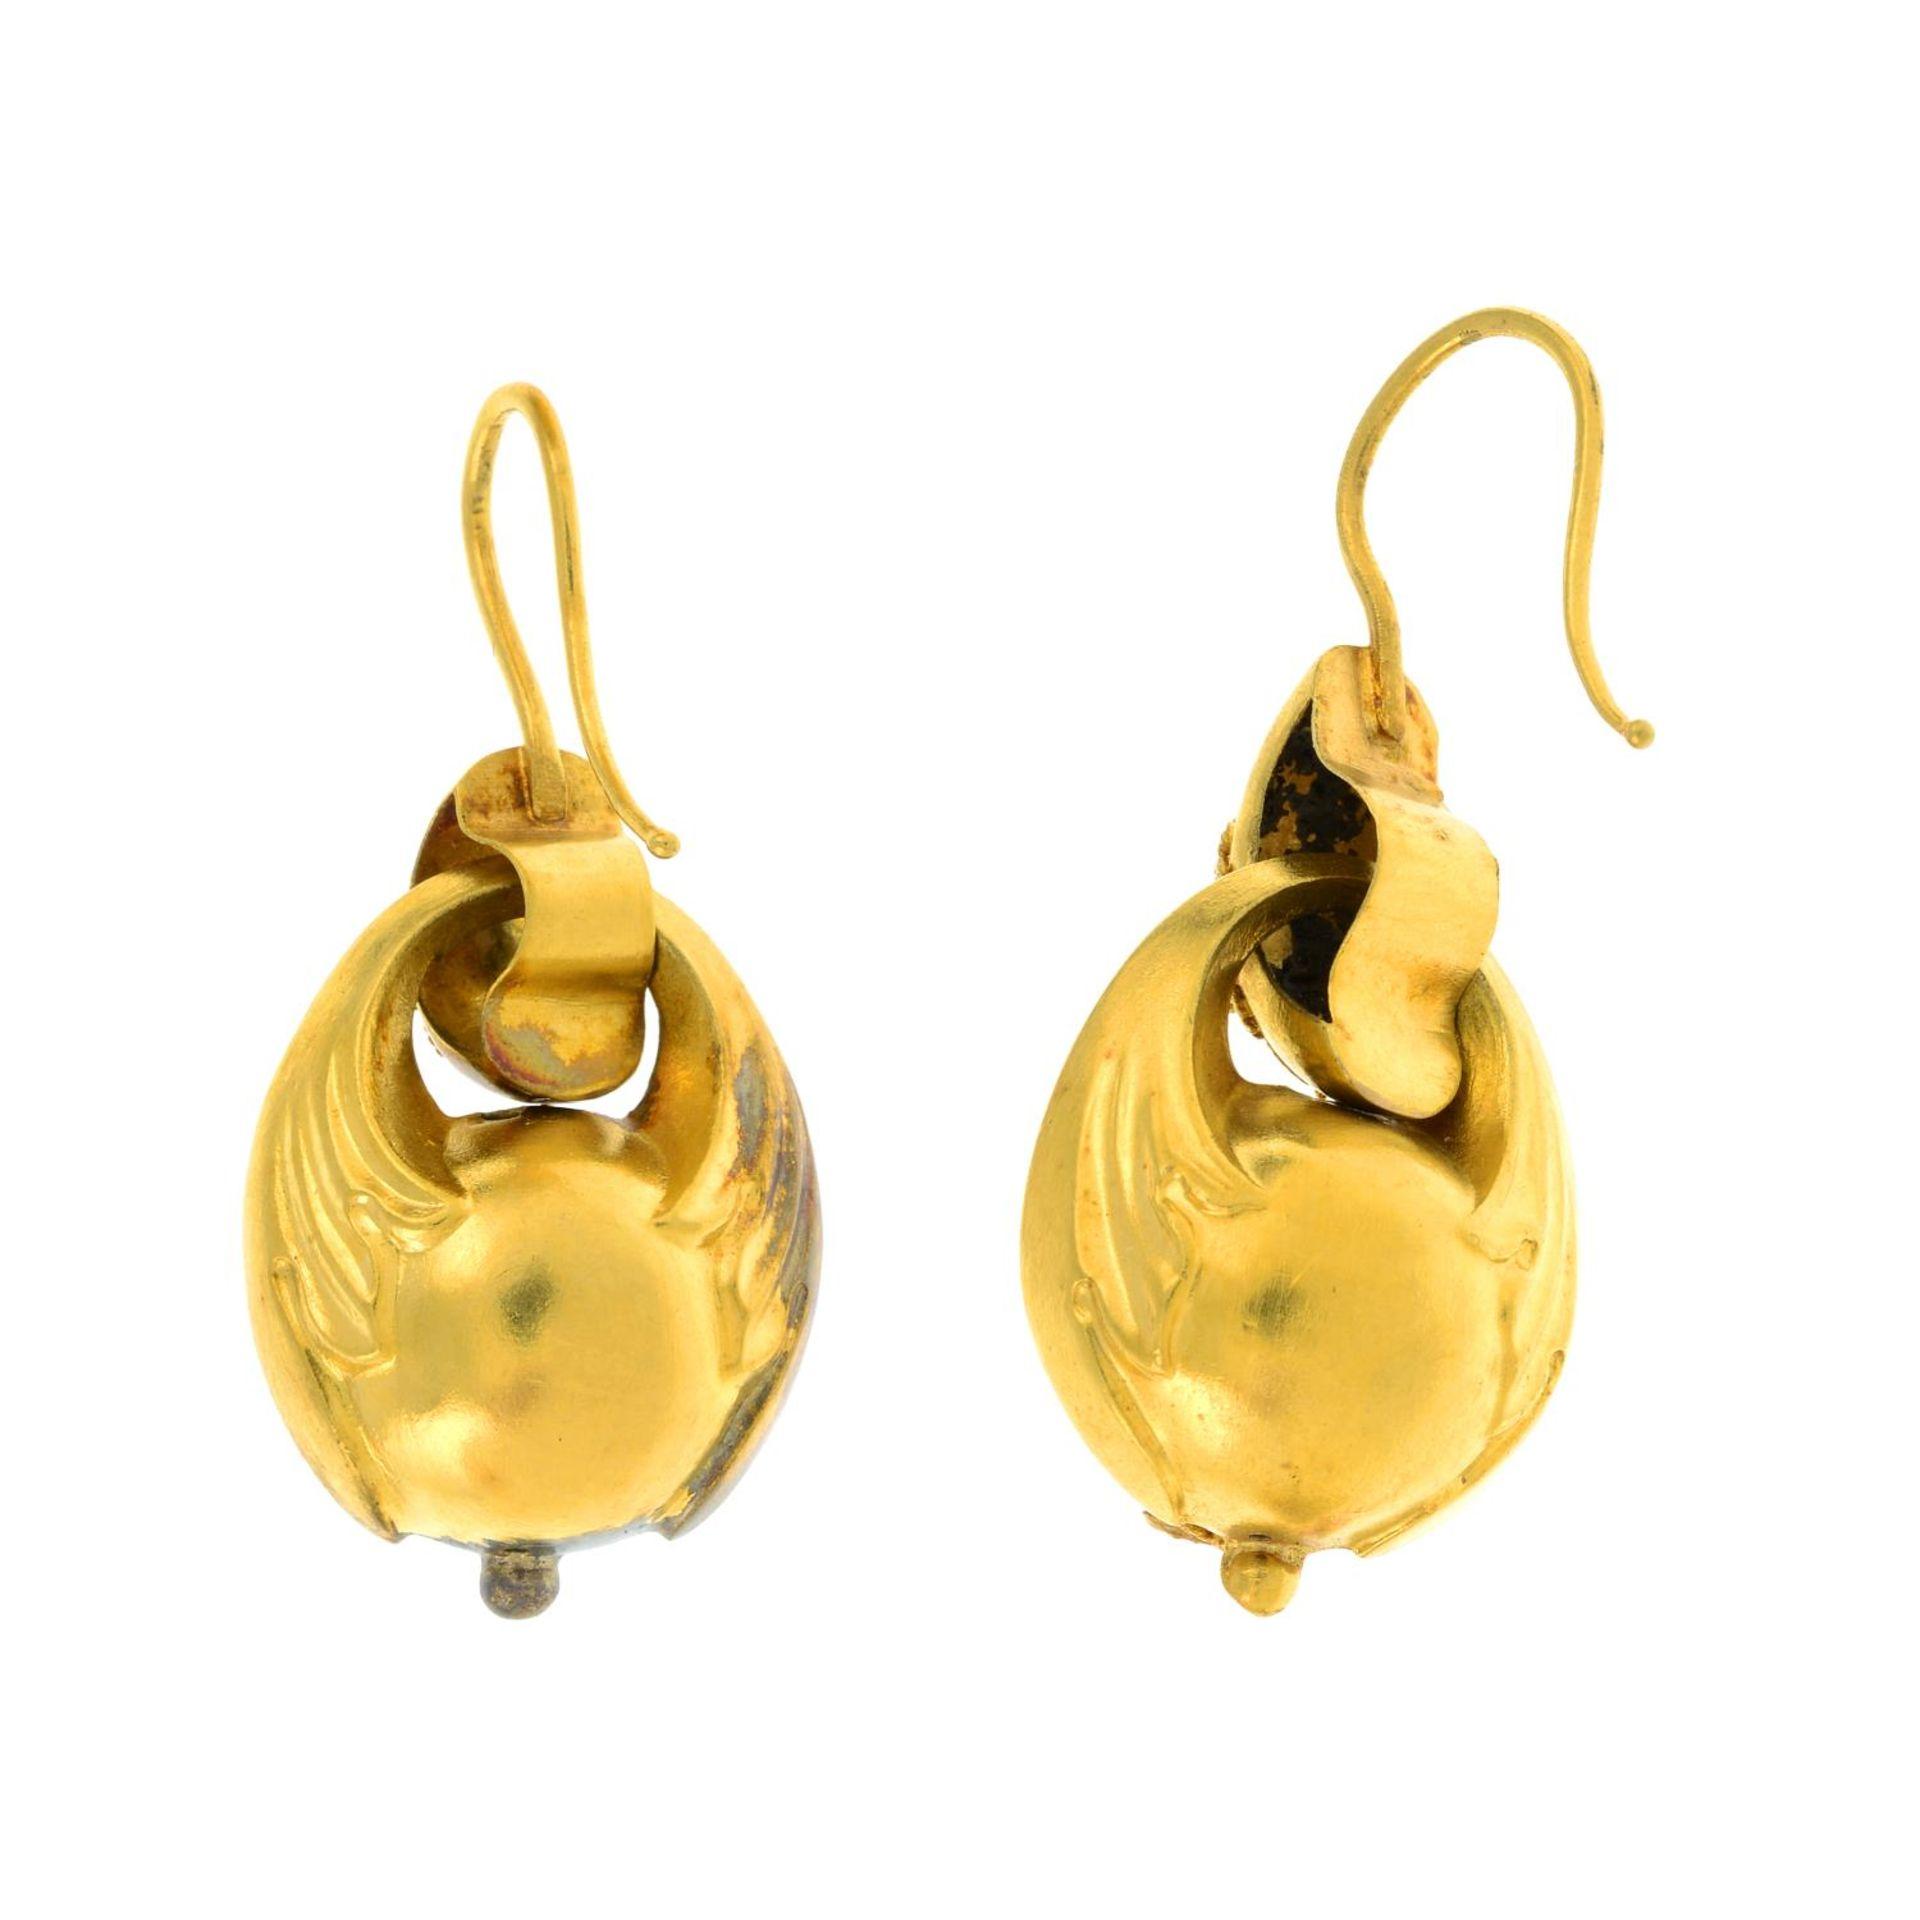 A pair of mid 19th century gold emerald drop earrings.Length 3.5cms. - Bild 2 aus 2